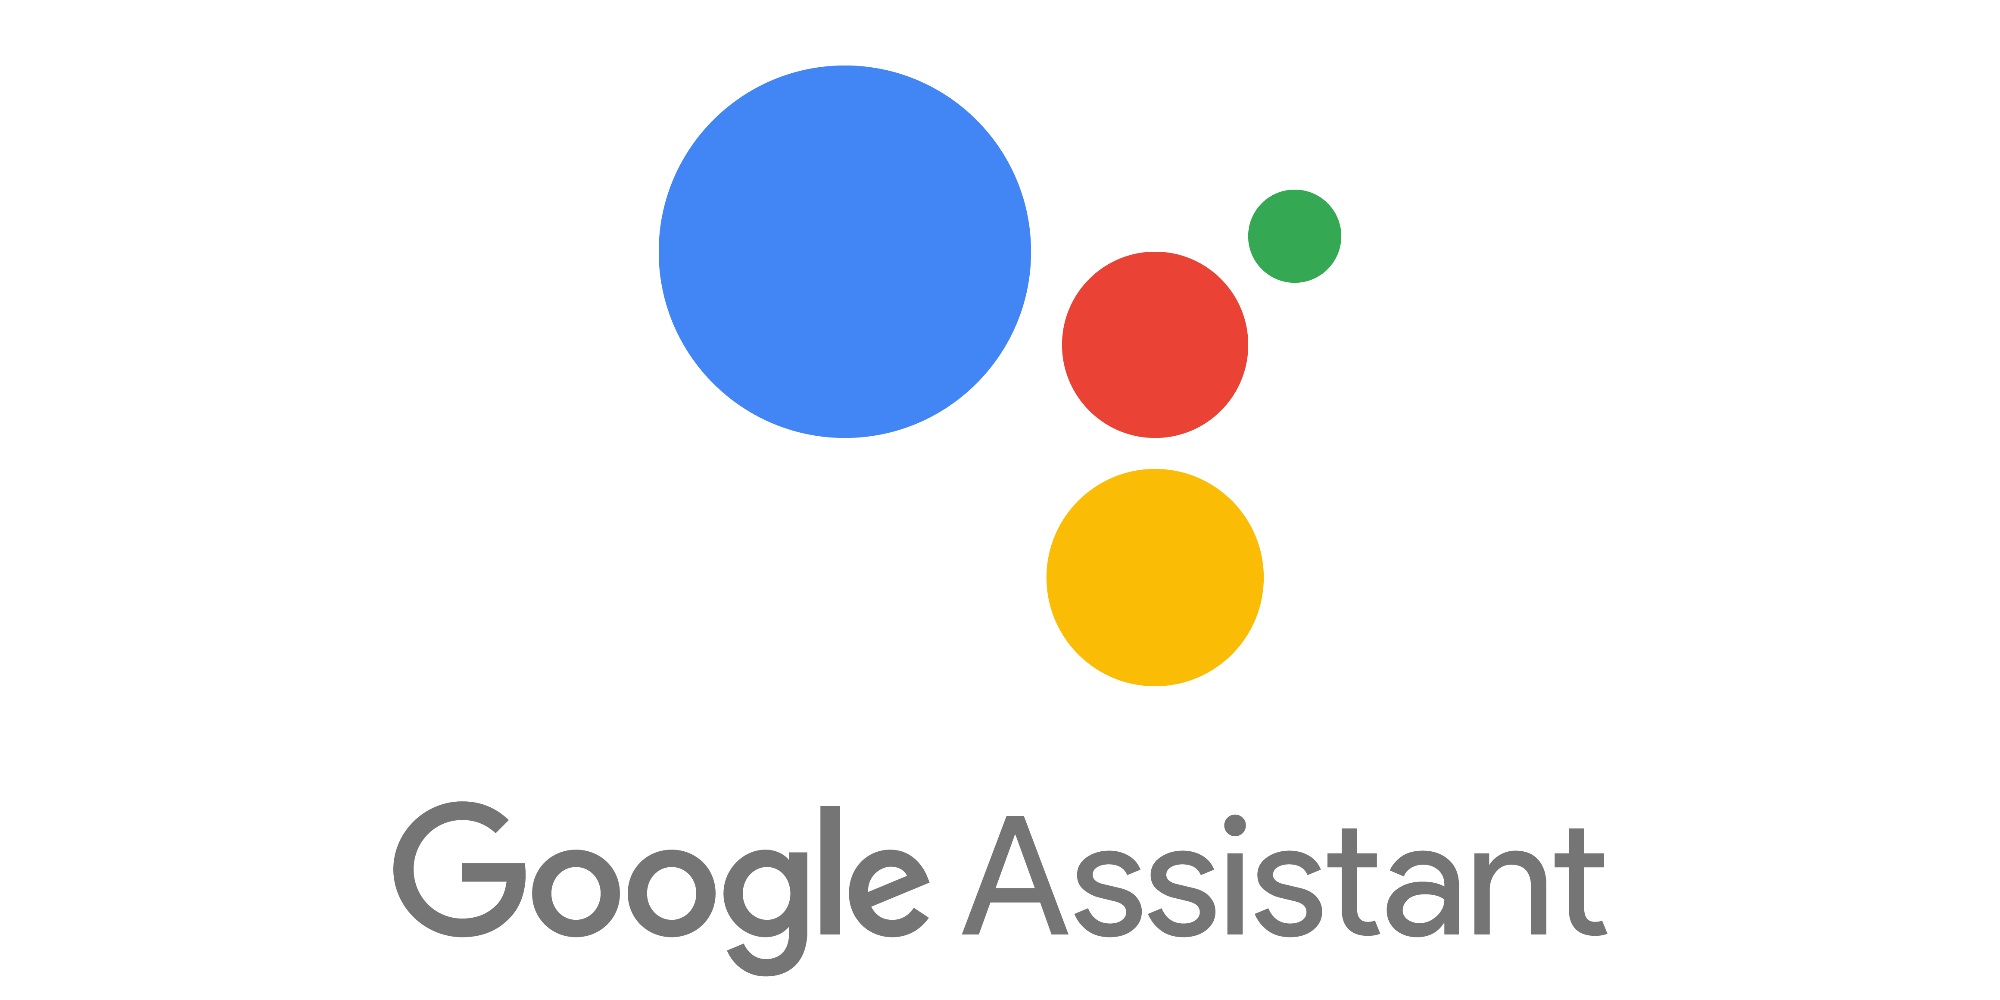 google assistant google home logo